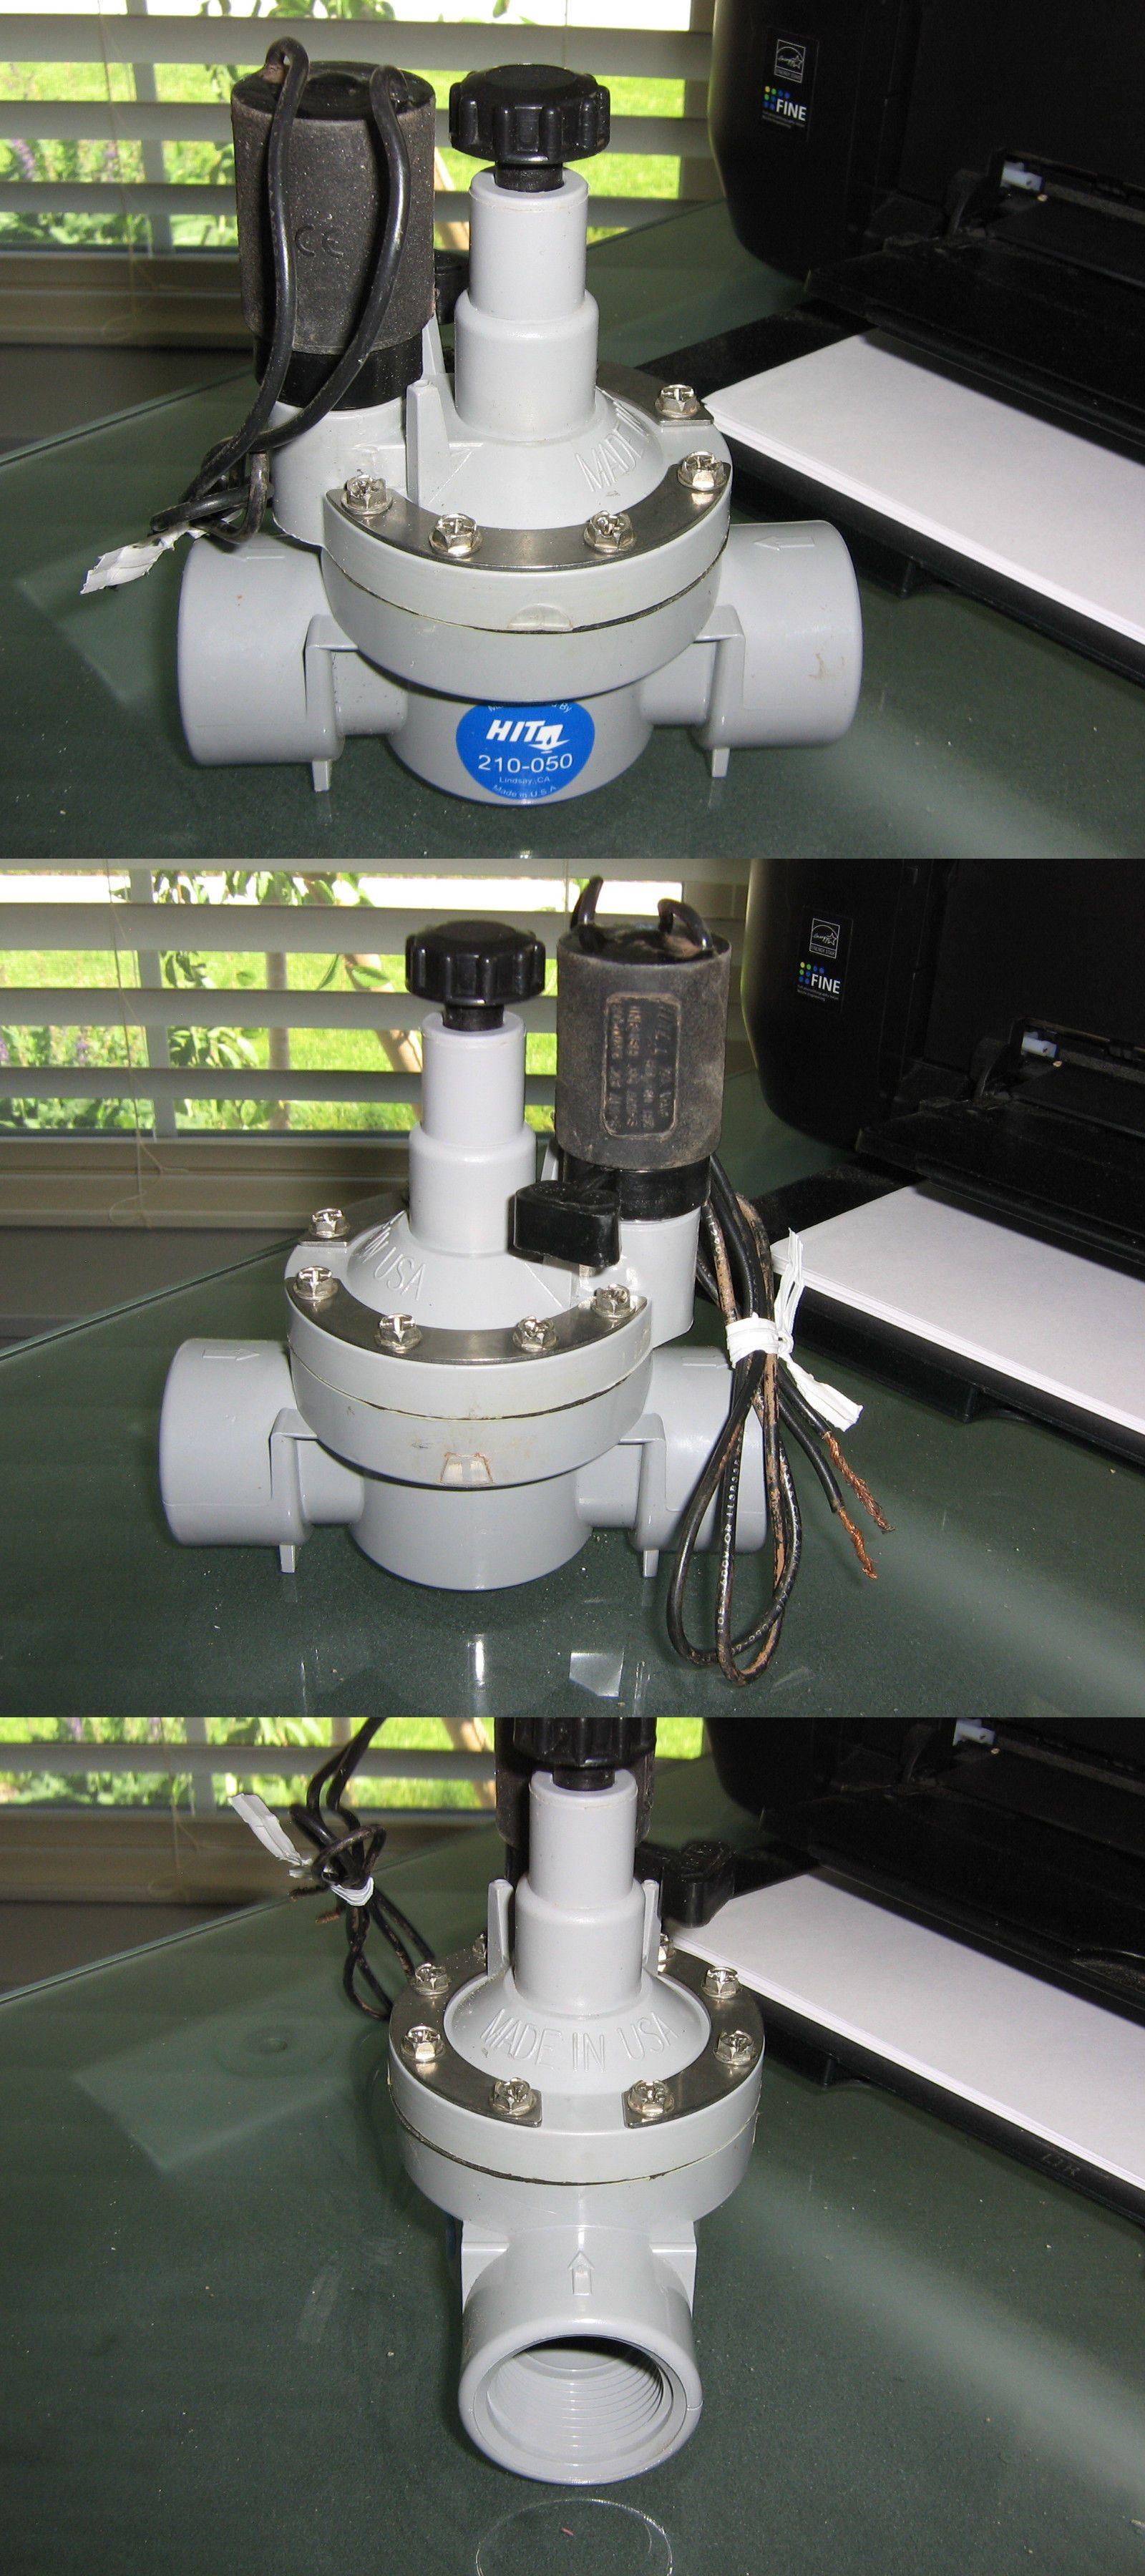 Valves 75673 Hit 210 050 Irrigation Flow Control Solenoid Valve Buy It Now Only 20 On Ebay Irrigation Valve Ebay